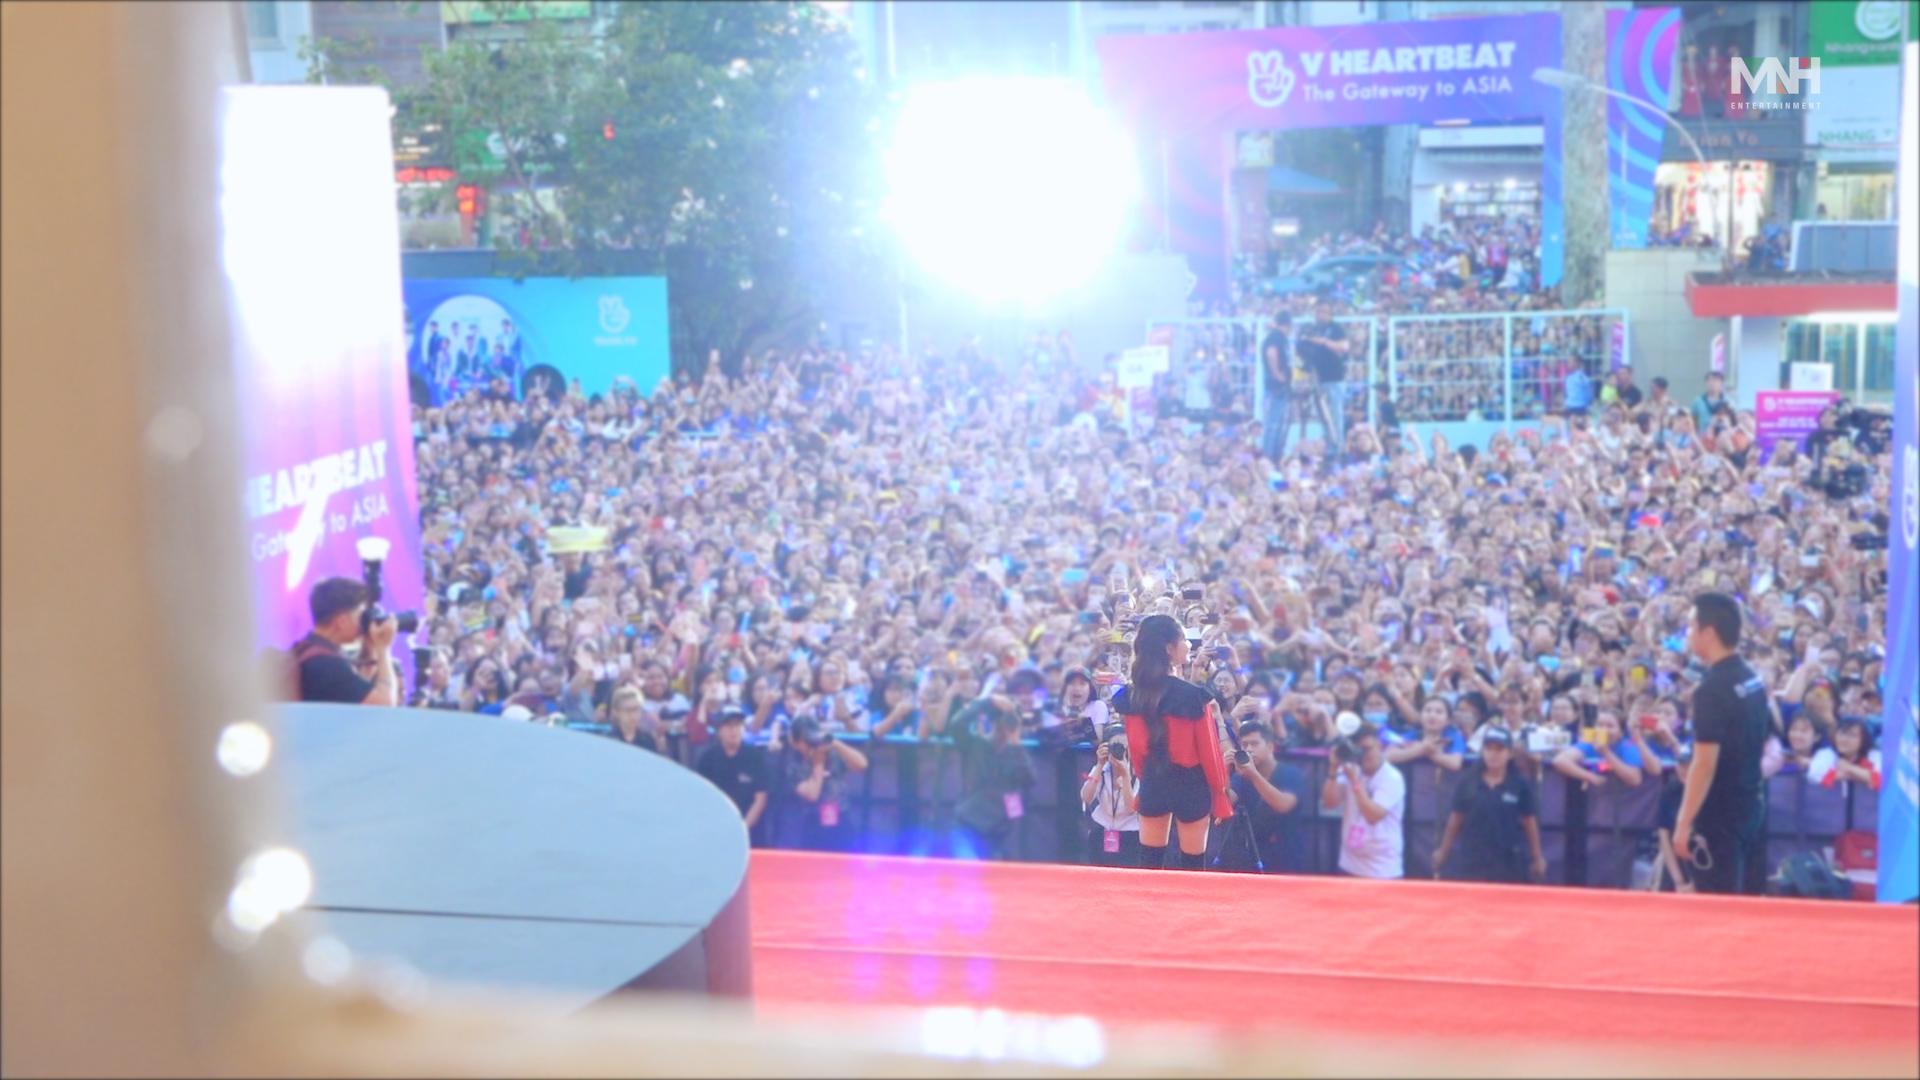 [Special Clips] 청하 베트남 'V HEARTBEAT LIVE' 비하인드